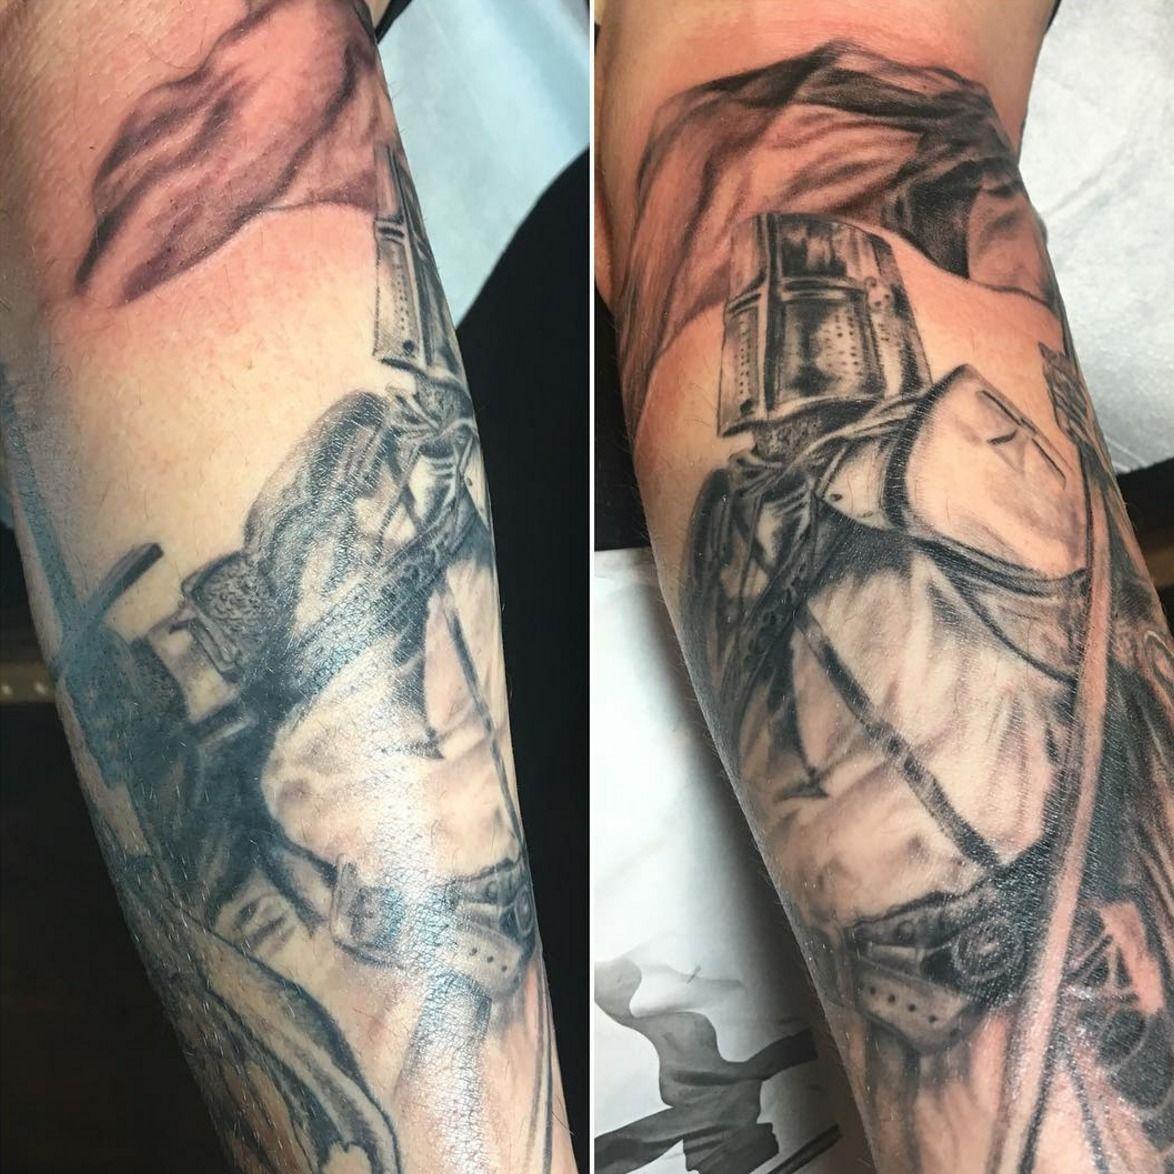 Jakitatutemplar Knight Knight Knight Tattoo Templar Black And Grey